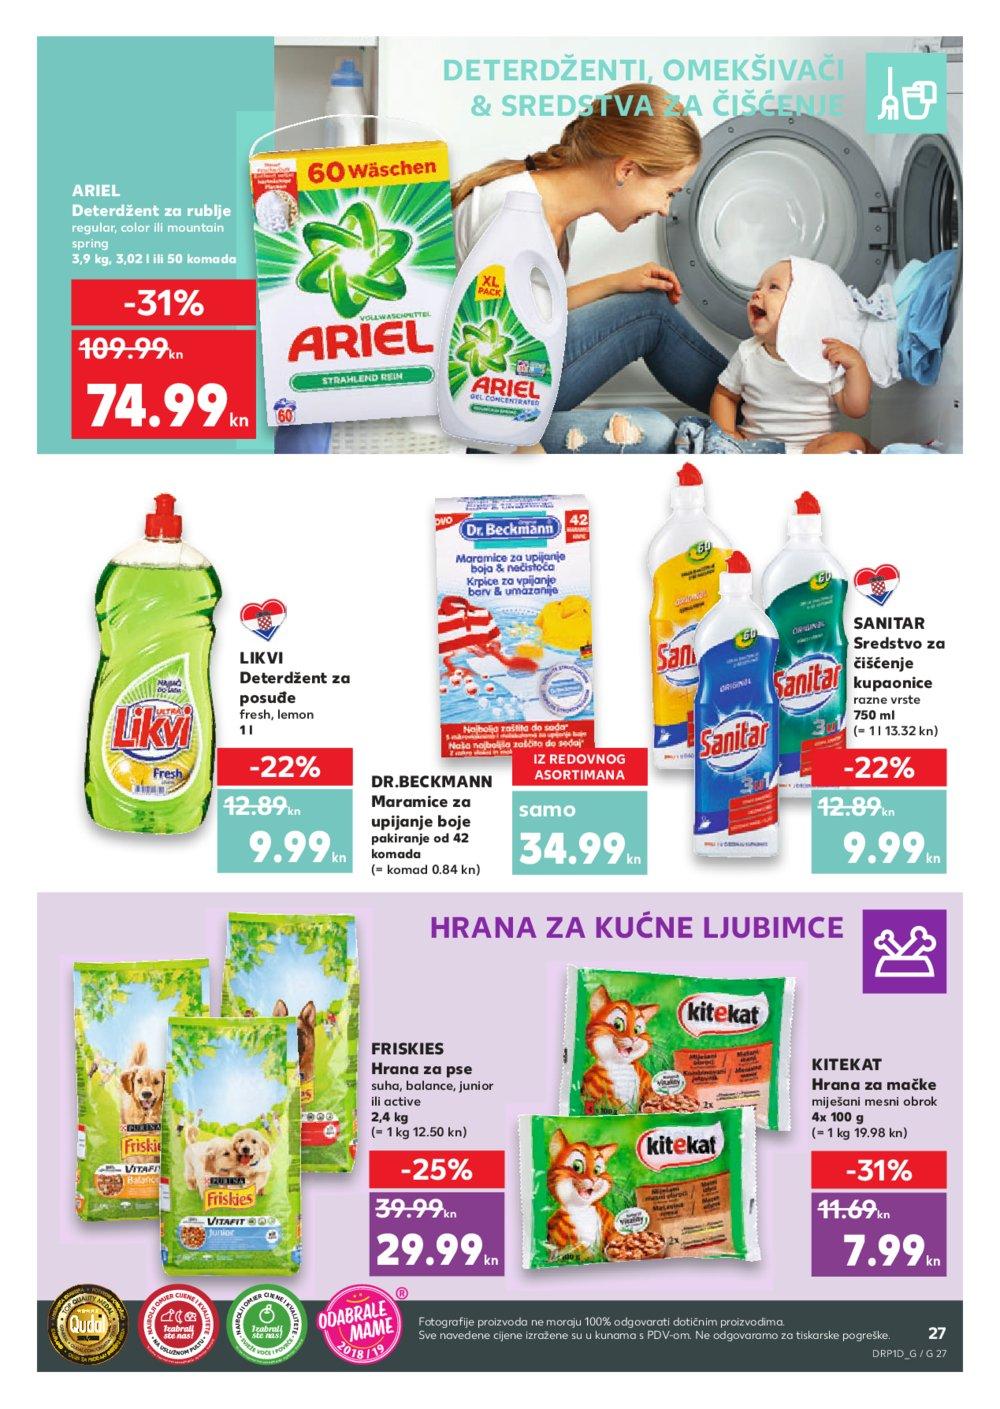 Kaufland katalog Akcija 09.05.2019.-15.05.2019. Bj Ča Ka Ko Ku Ng Os Po Sa Se Sk Sb Sp Ši Tr Um Va Vin Vir Za Zg Zap